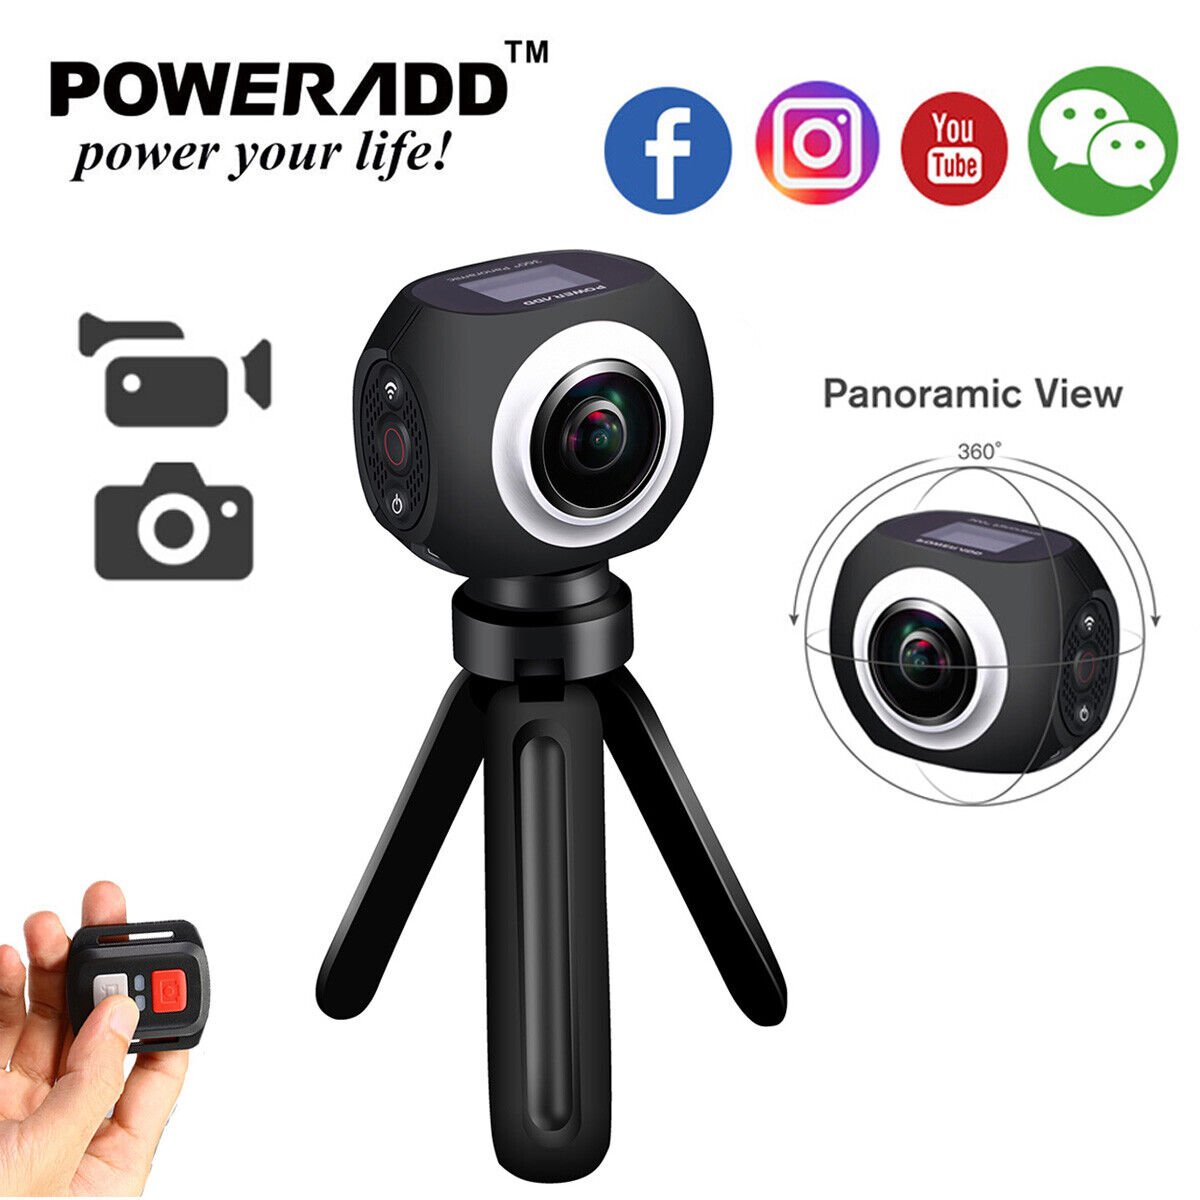 Poweradd 1080P 360° Panoramic Digital WiFi HD Video Sports DVR VR Action Camera 1080p action camera digital dvr panoramic poweradd sports video wifi